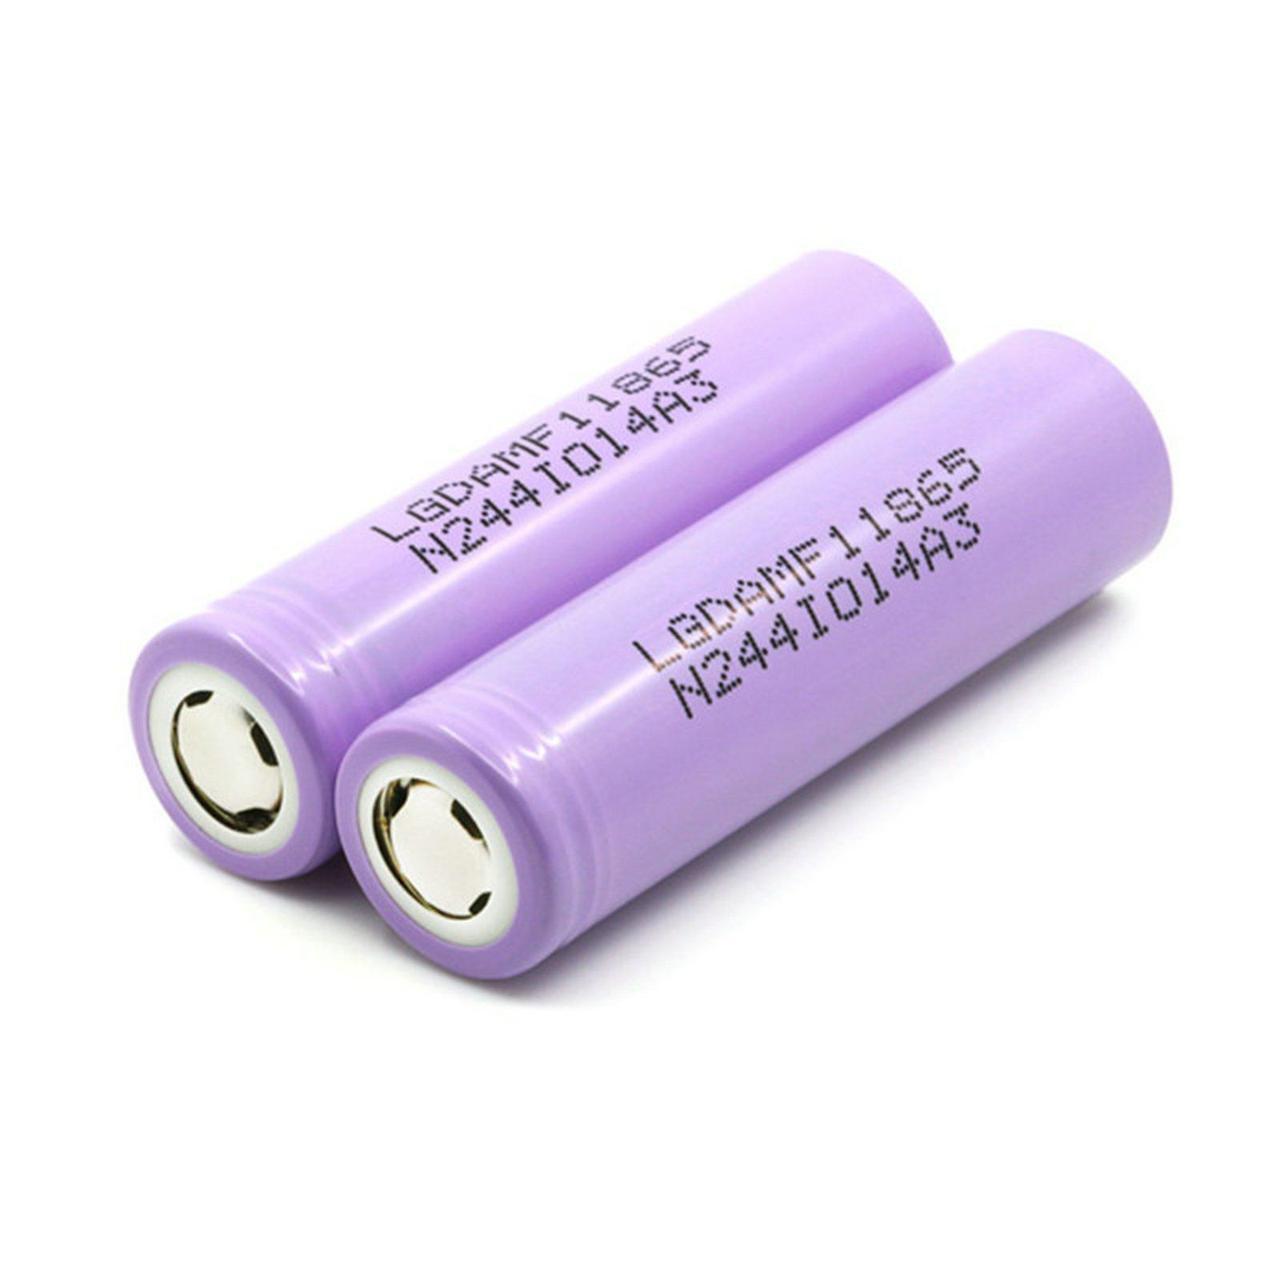 Аккумулятор 18650 Li-Ion LG INR18650 MF1 (LGDAMF11865), 2150mAh, 10A, 4.2/3.65/2.75V